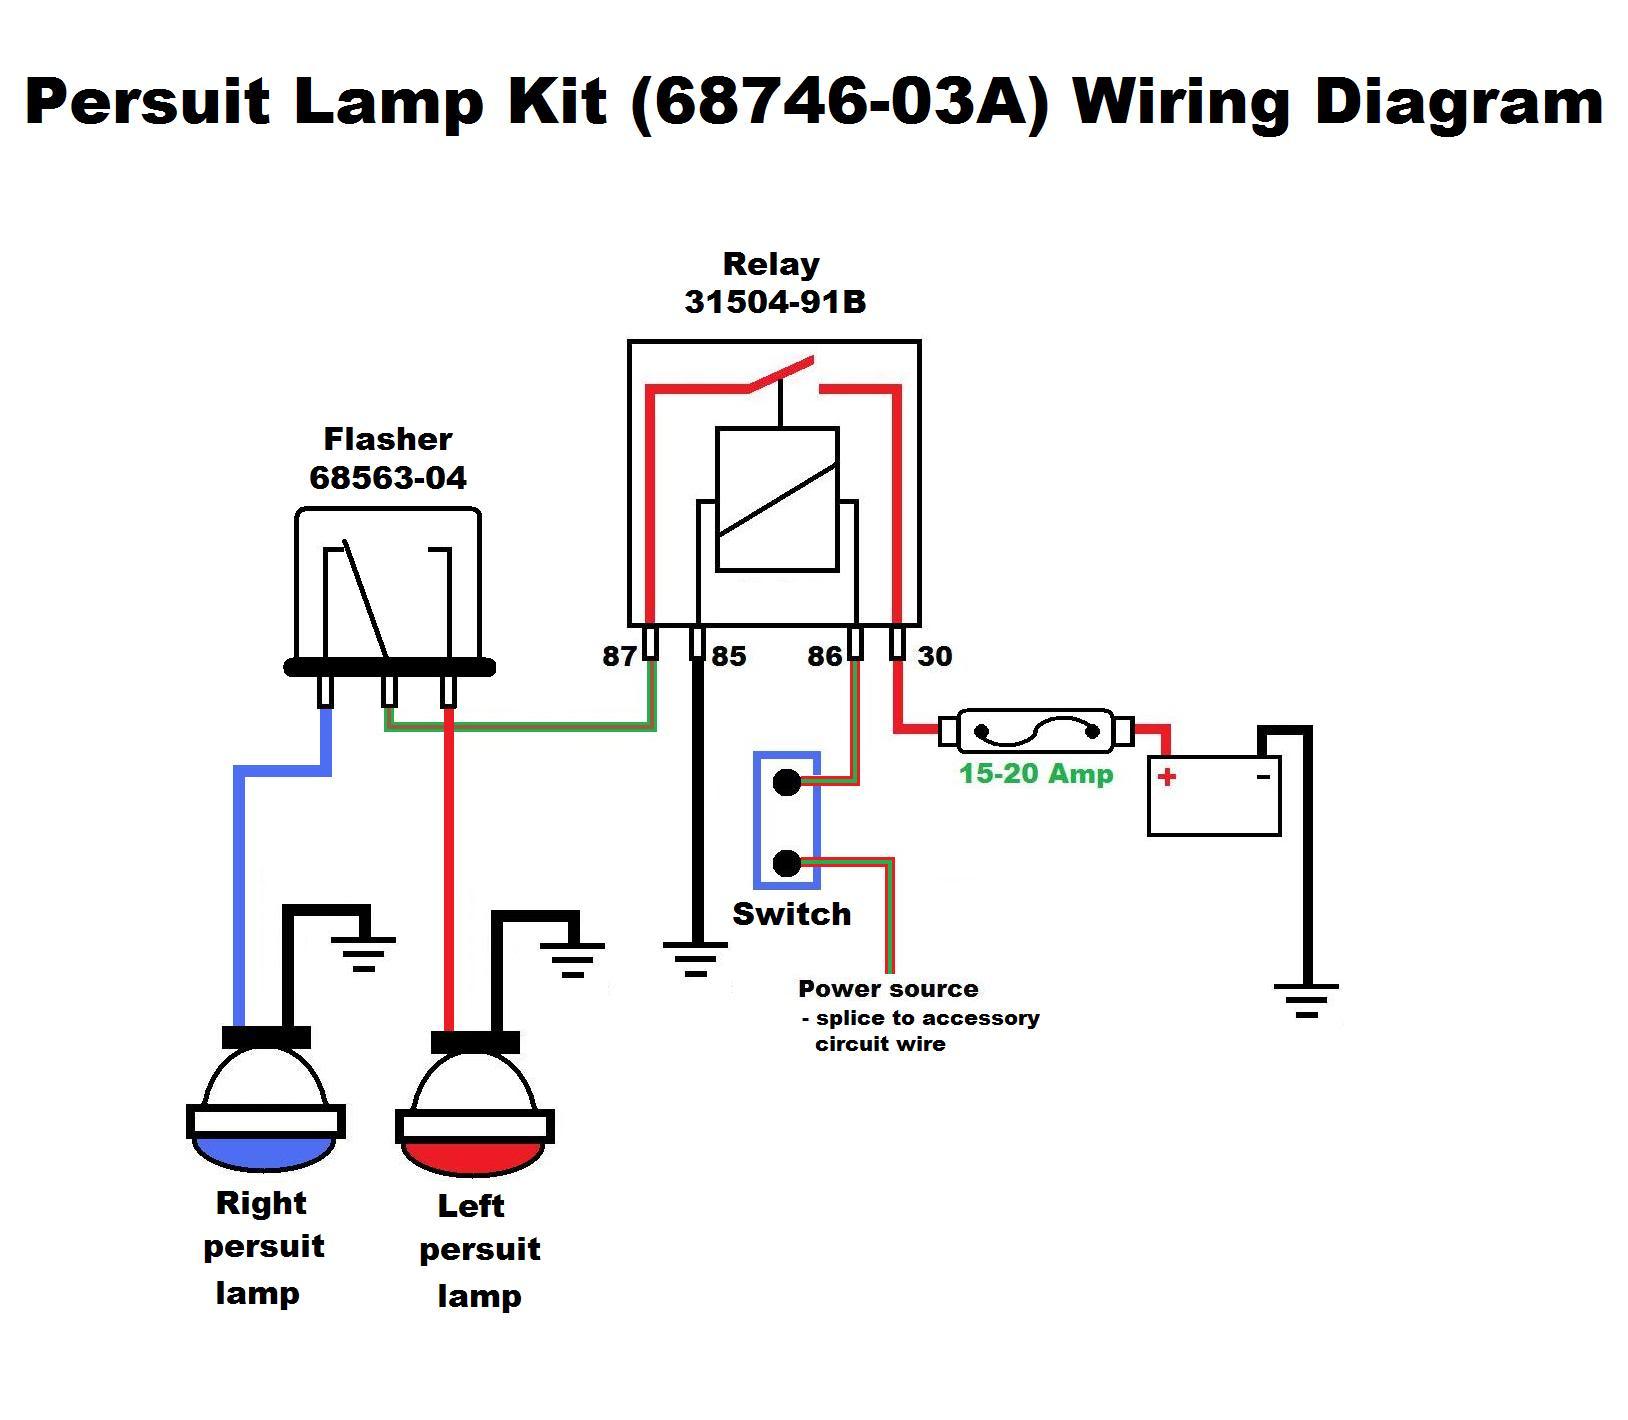 hight resolution of harley davidson wiring harness diagram further starter basic harley wiring diagram 2004 2007 harley davidson wiring schematics and diagrams